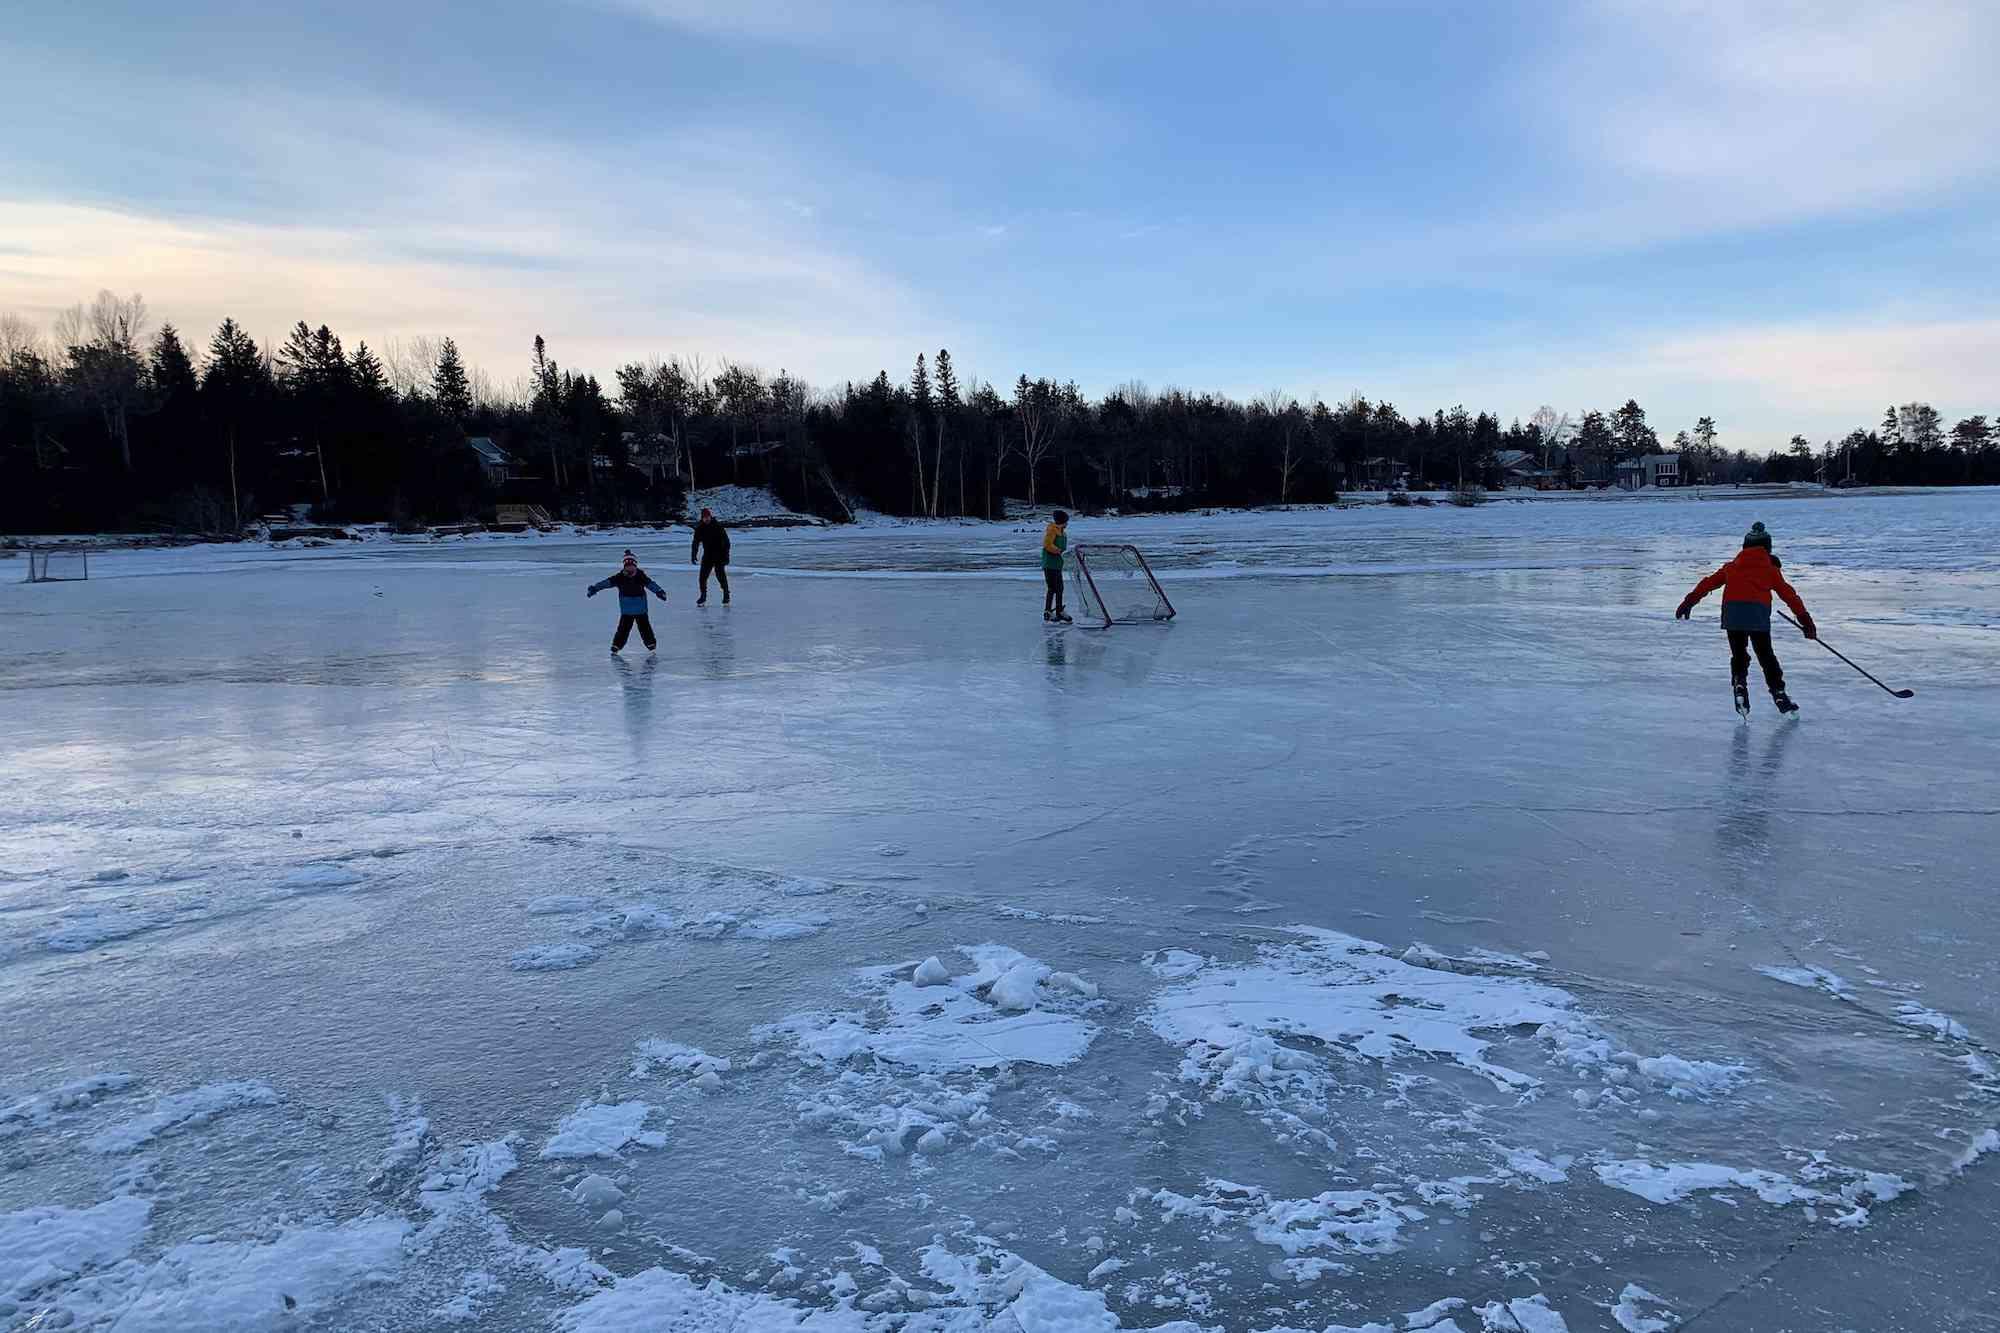 early morning hockey on the lake